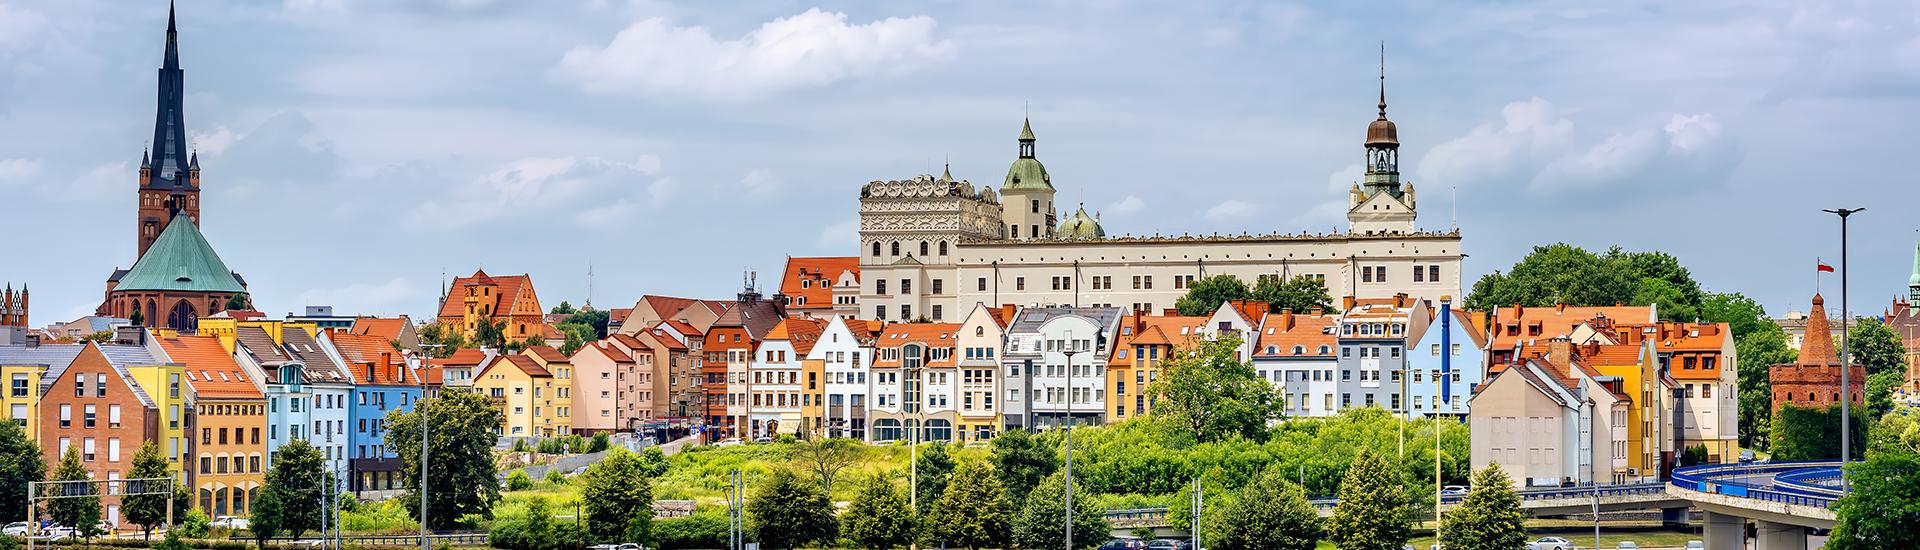 Kulturelles Angebot in Stettin